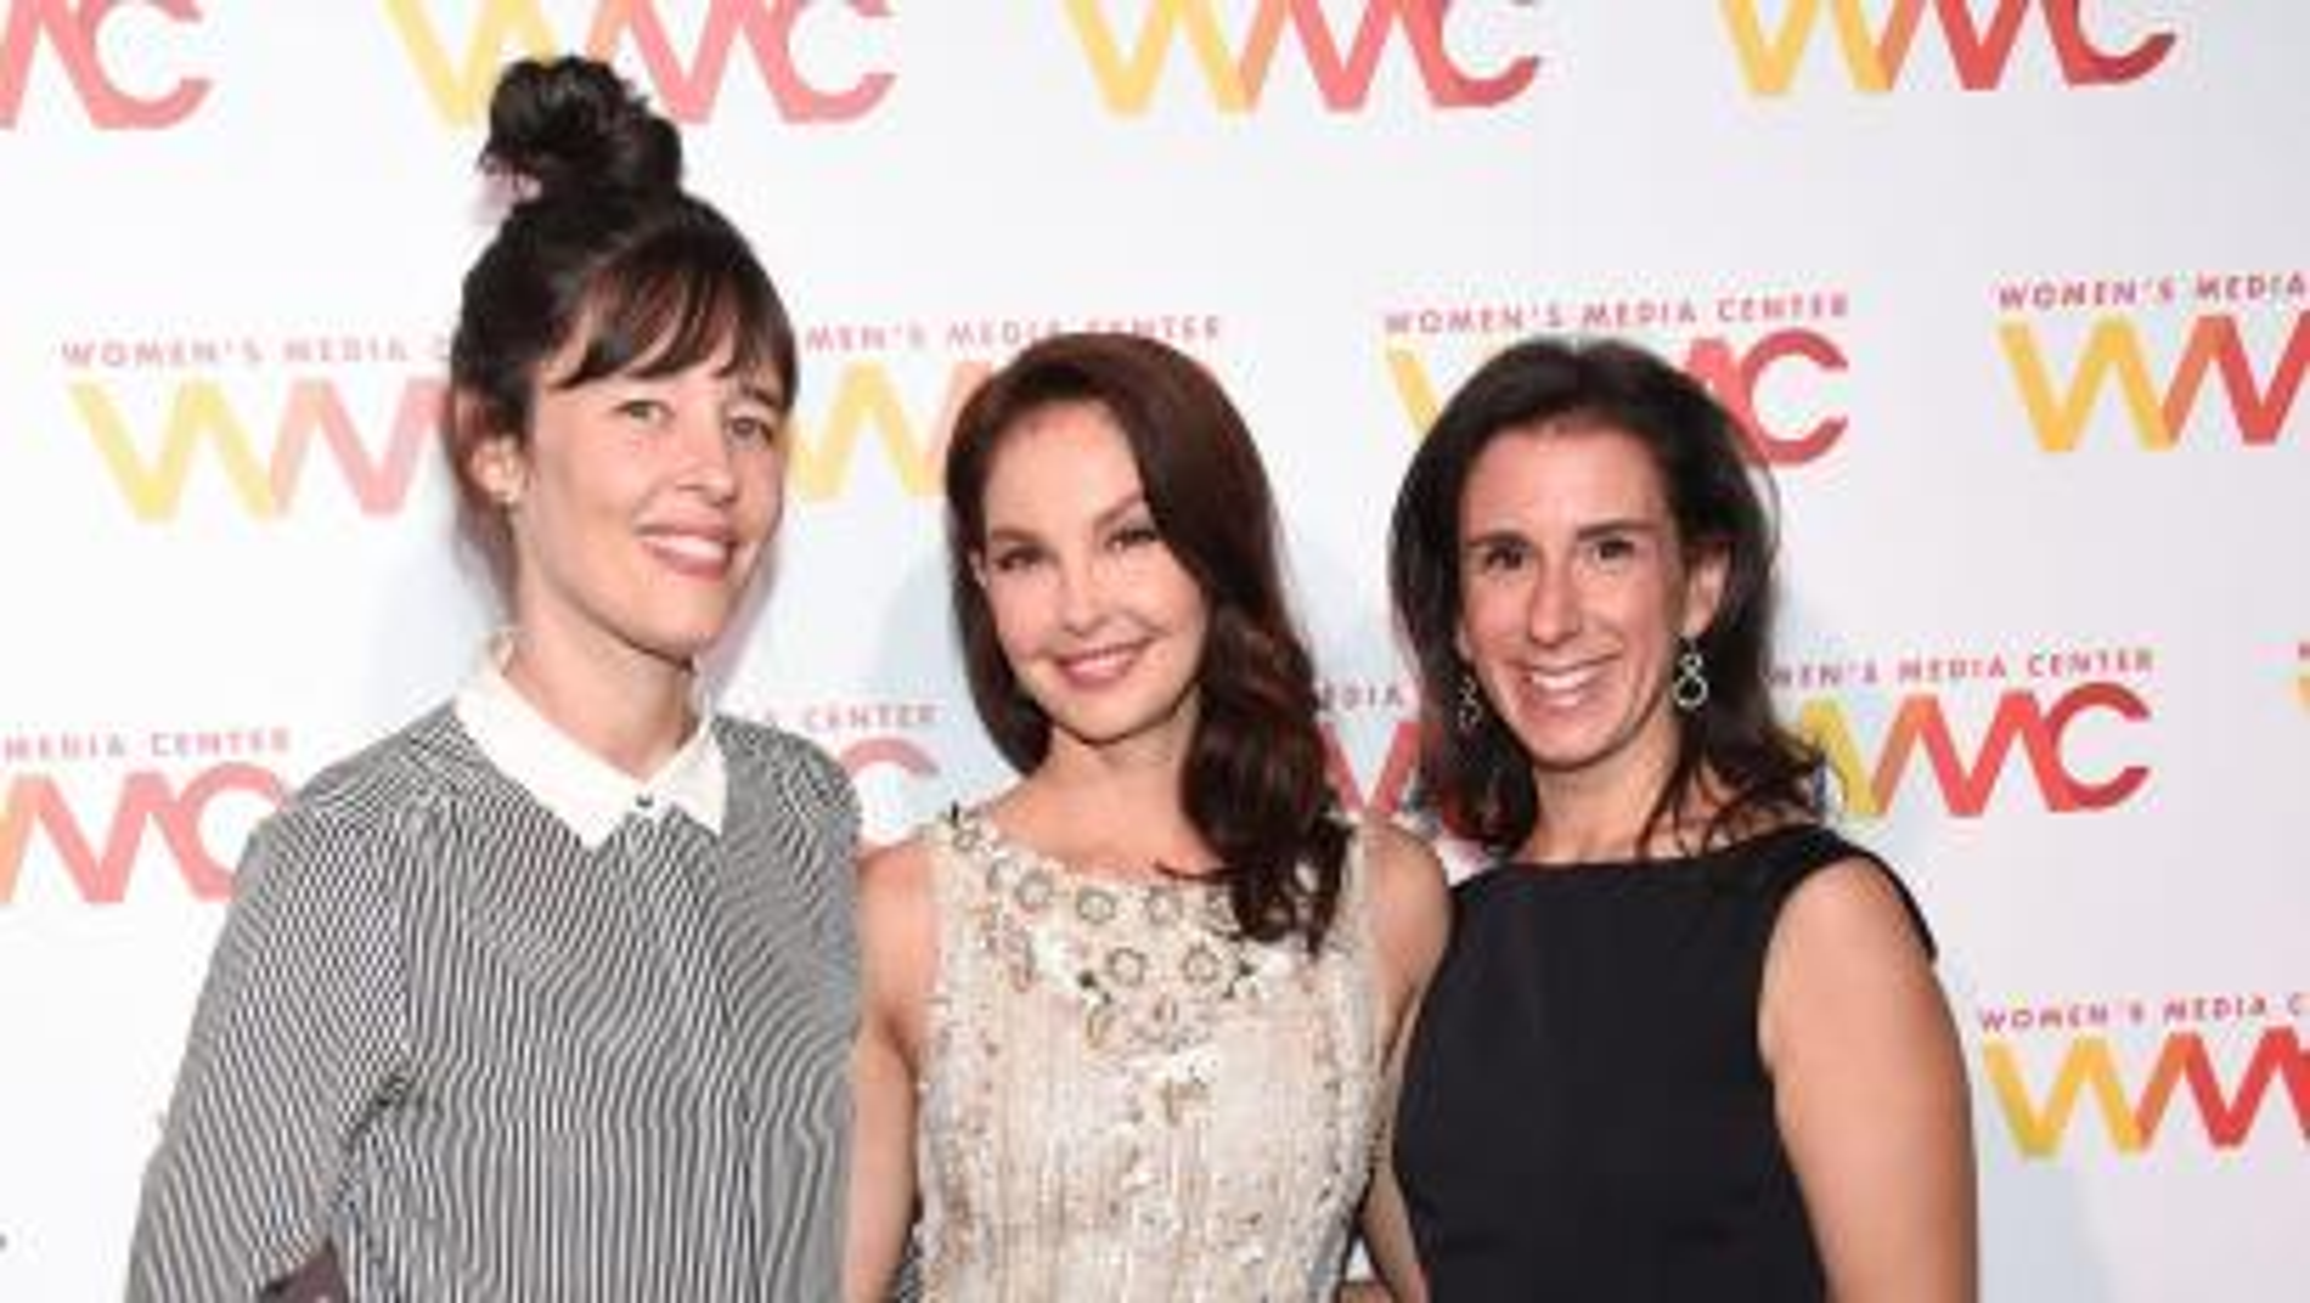 Megan Twohey, Ashley Judd, Jodi Kantor